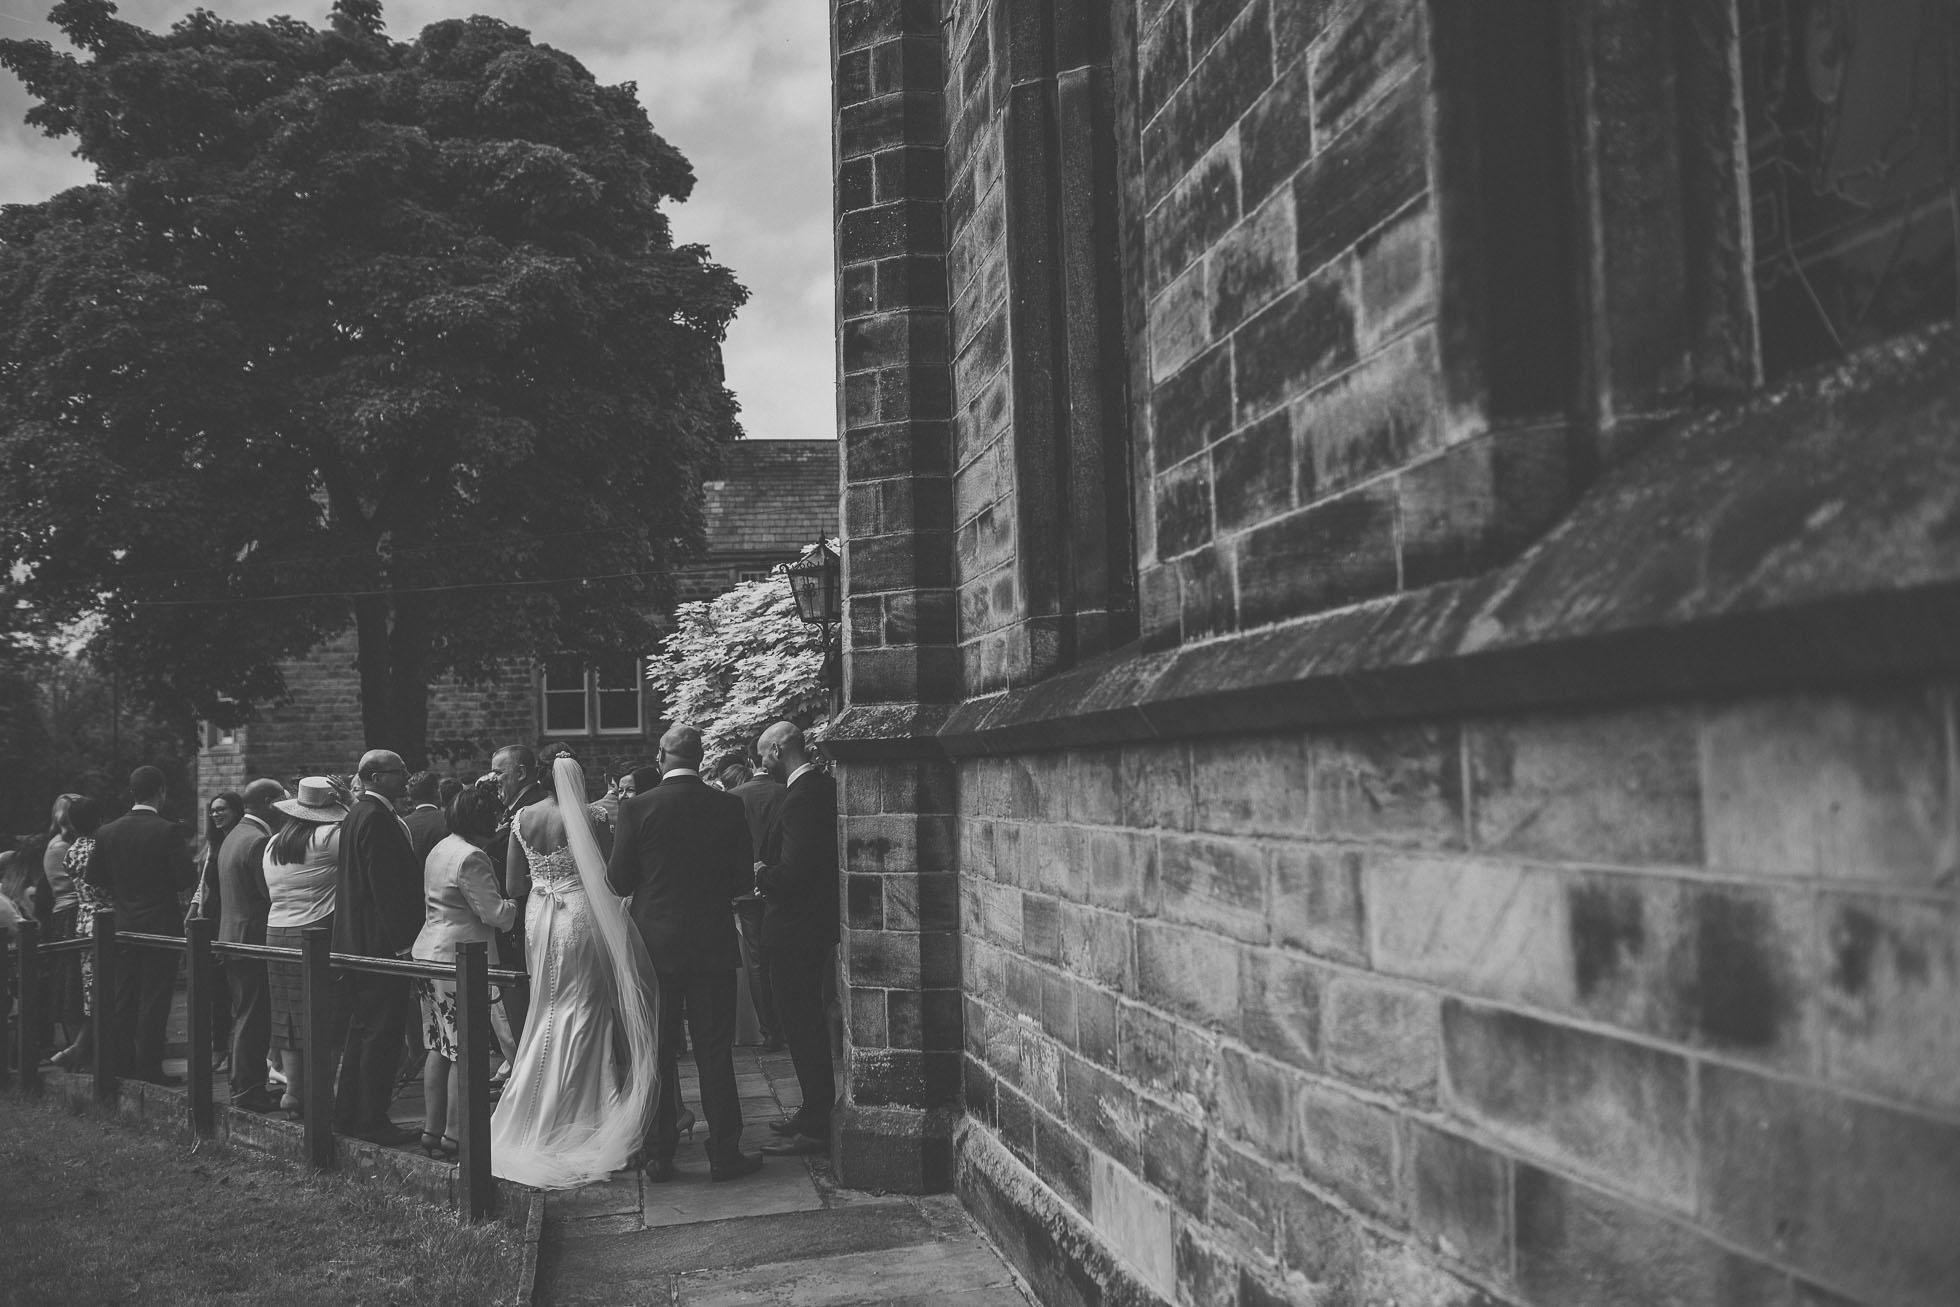 denton-hall-wedding-photographer-34.jpg